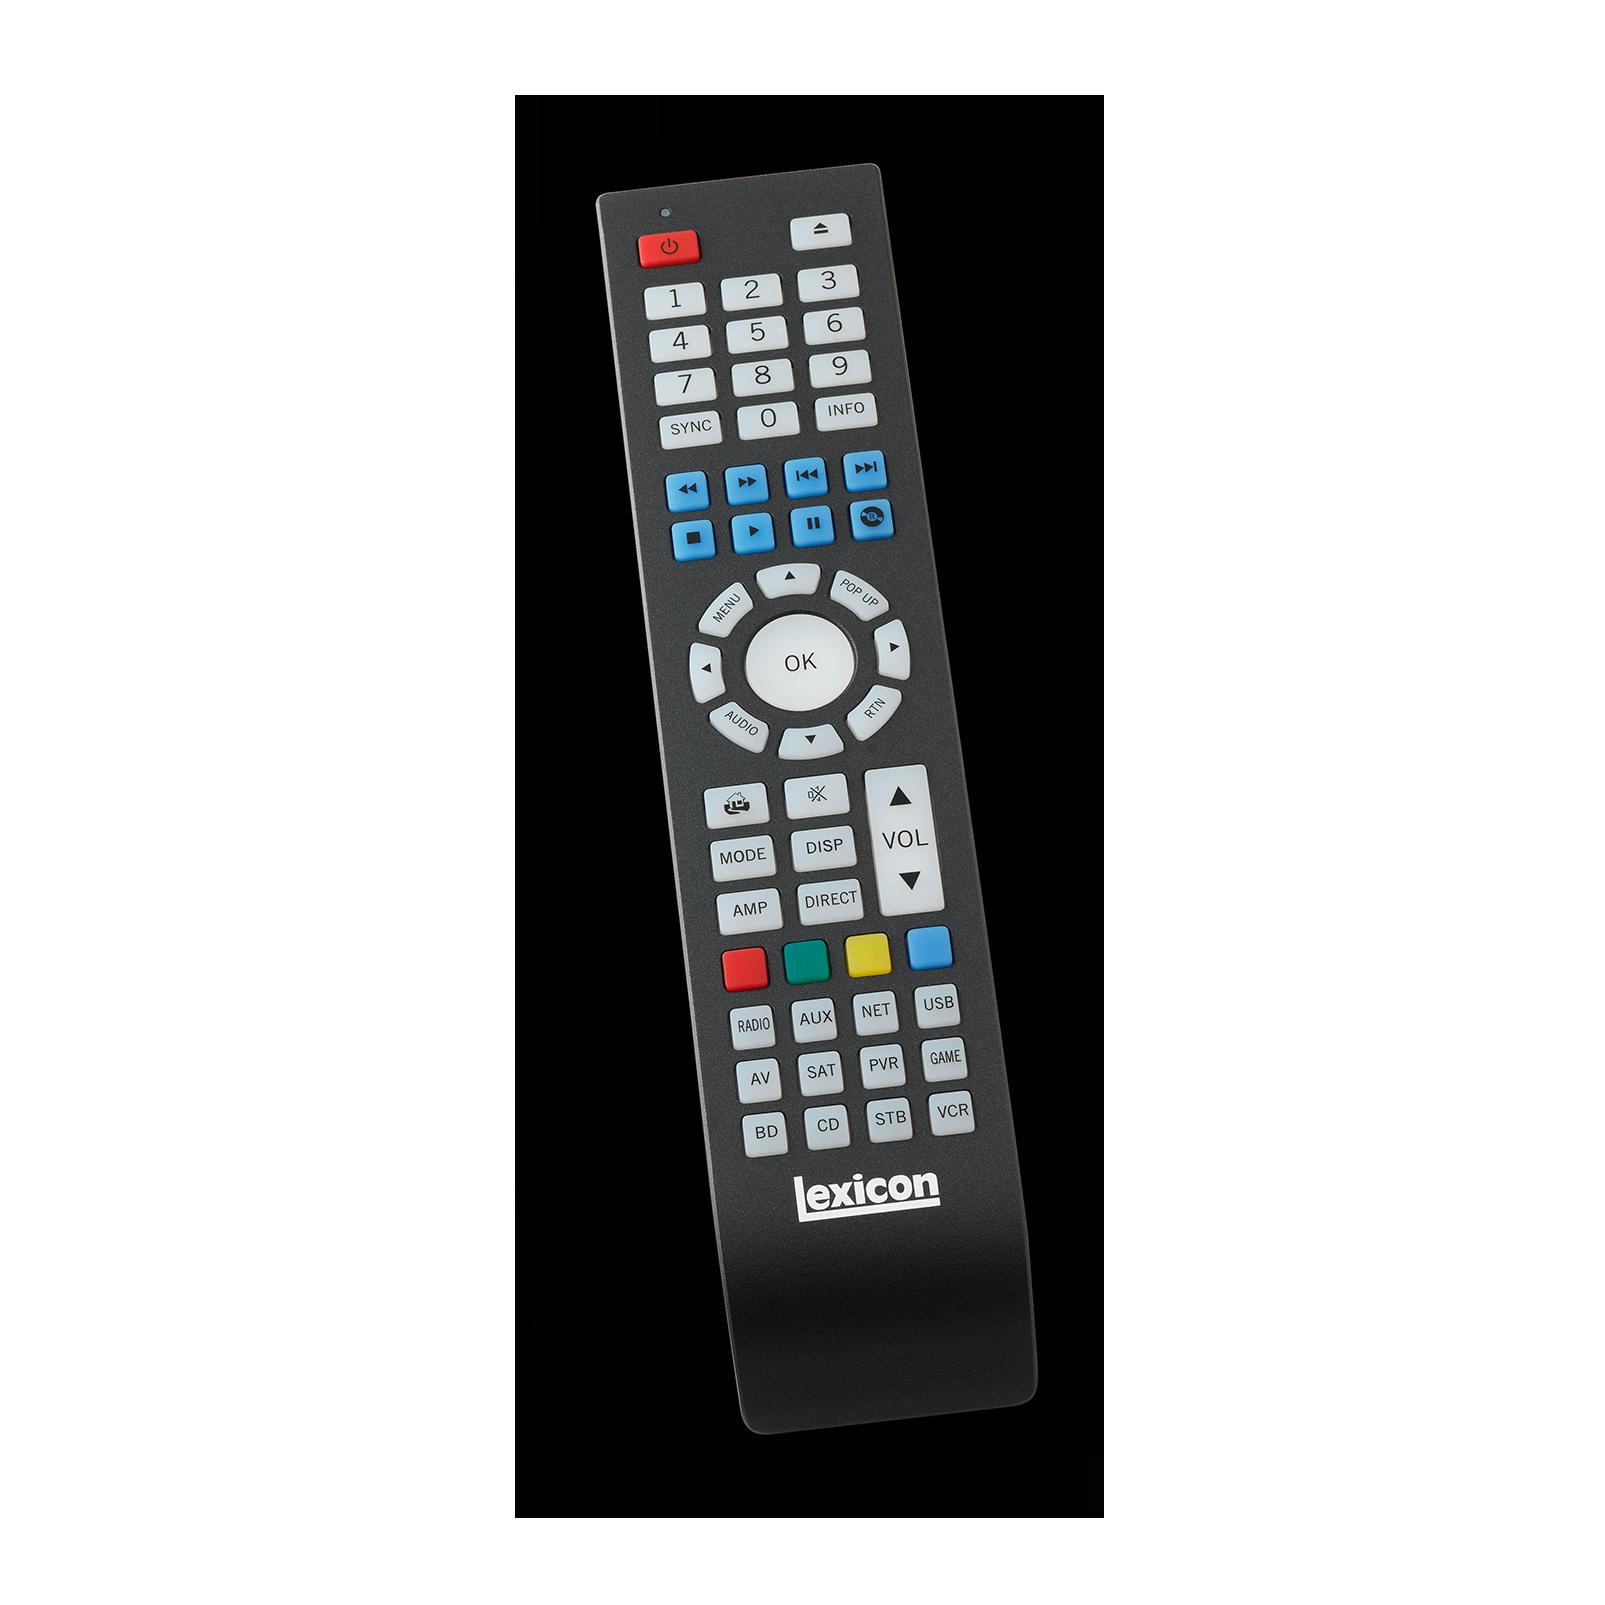 Lexicon RV-9 - Black - Class G Immersive Surround Sound AVR - Detailshot 3